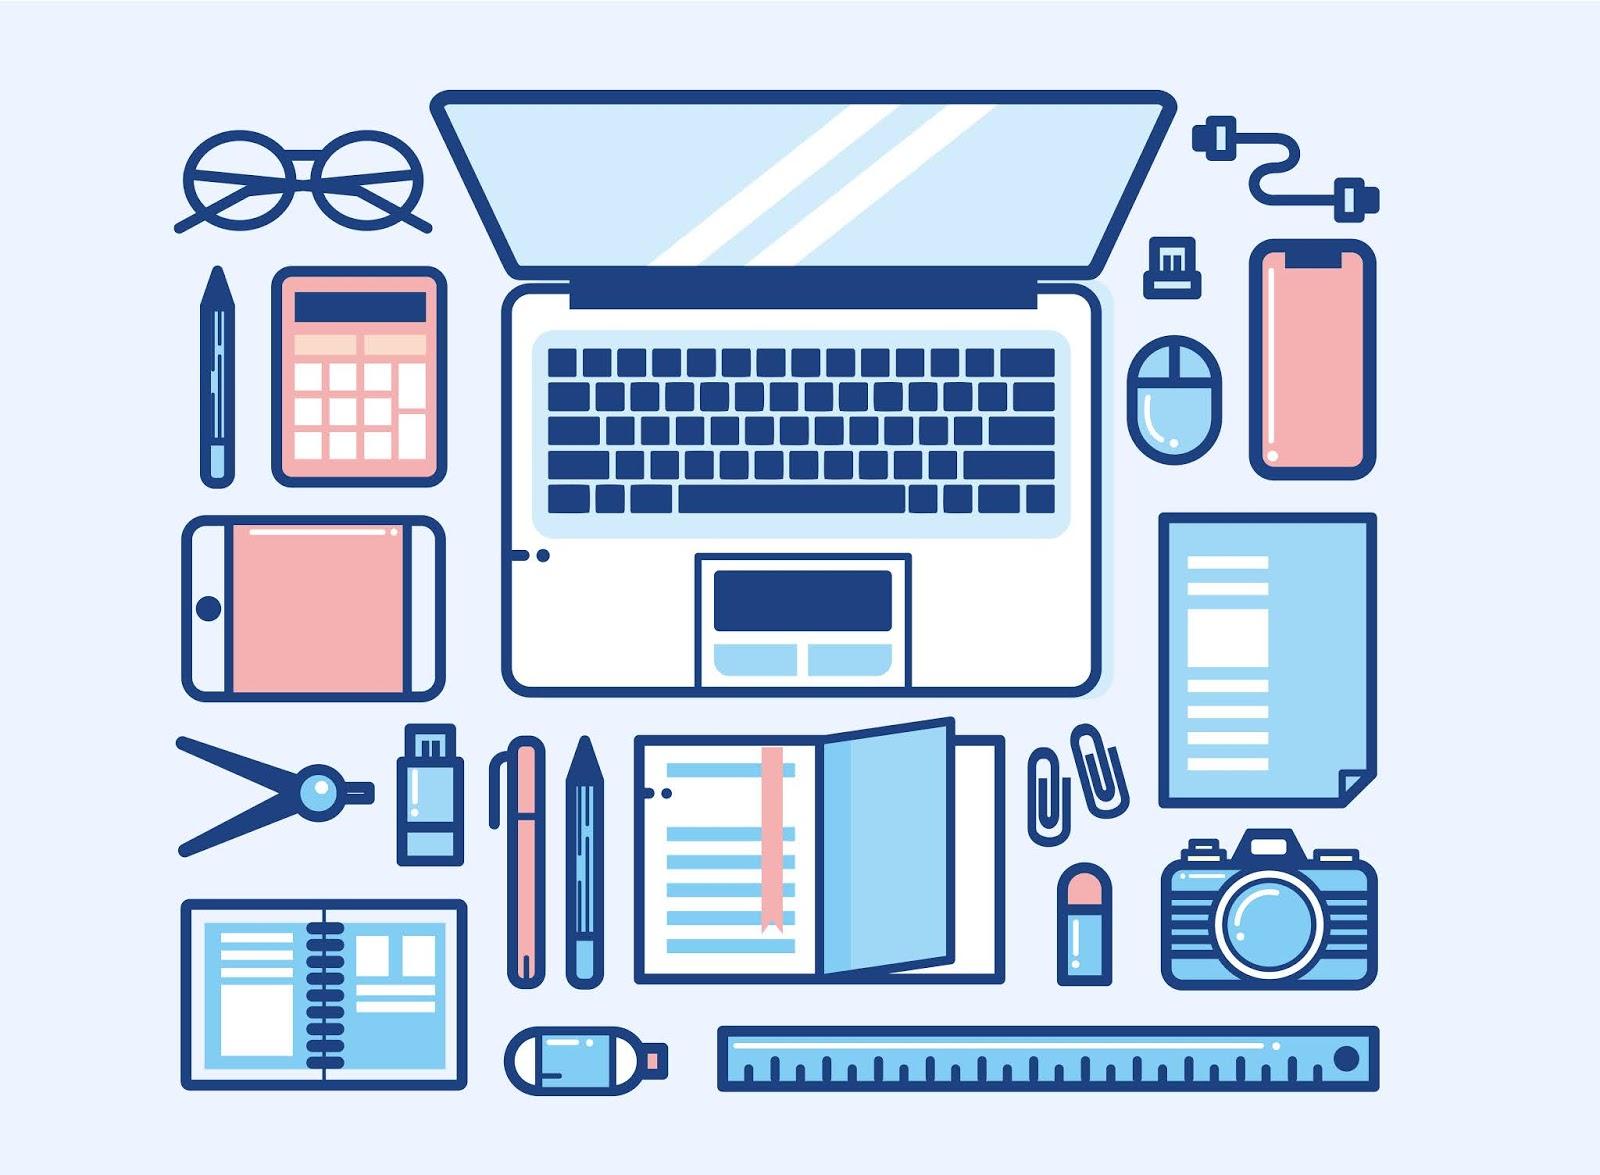 Workspace Desktop Design Free Download Vector CDR, AI, EPS and PNG Formats